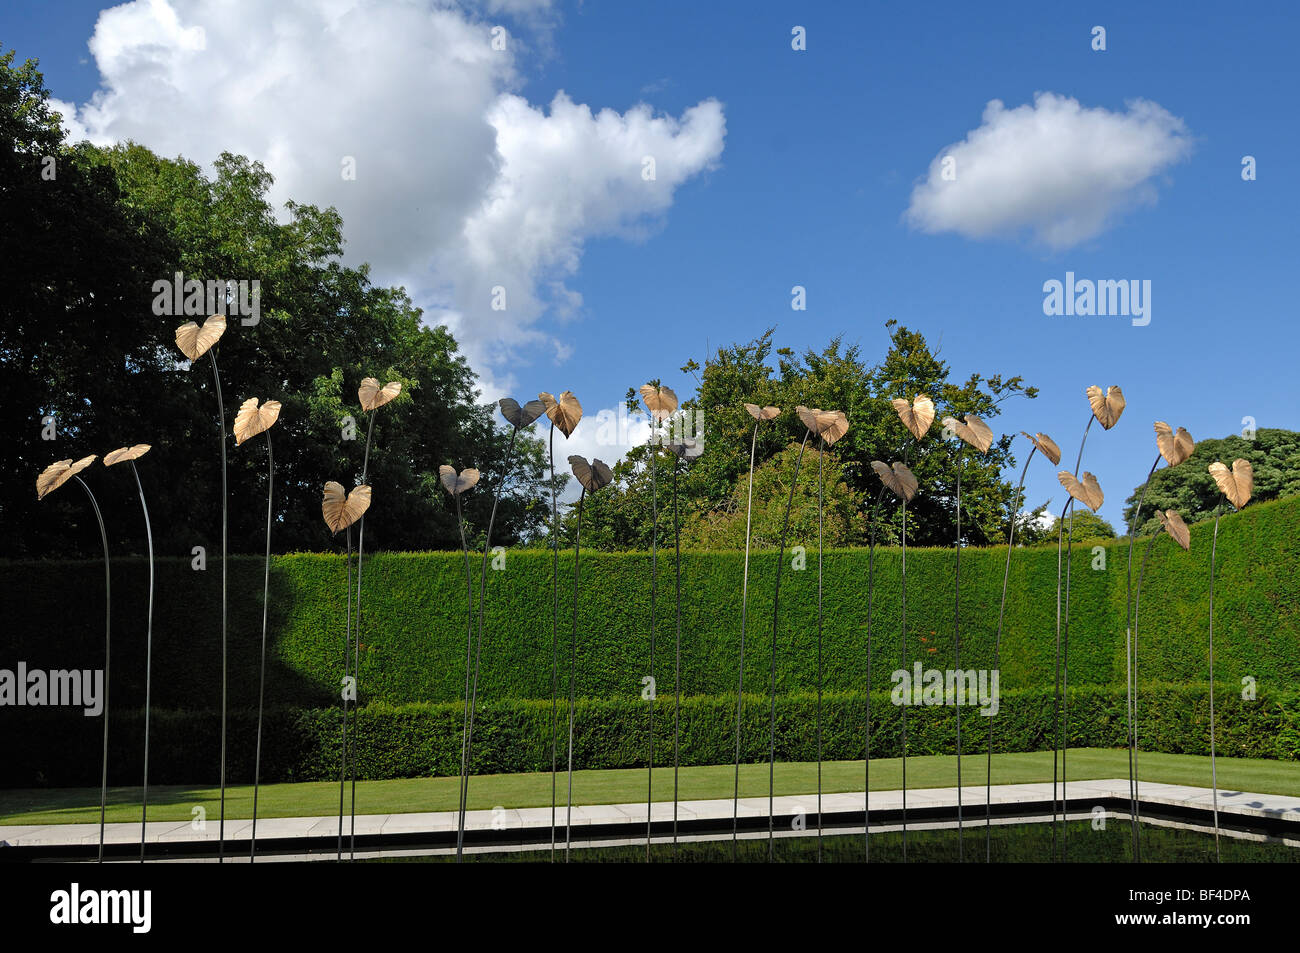 Modern Art by Simon Allison, 'Gold-plated bronze leaves on steel rods', in Kiftsgate Court Gardens, Mickleton, - Stock Image